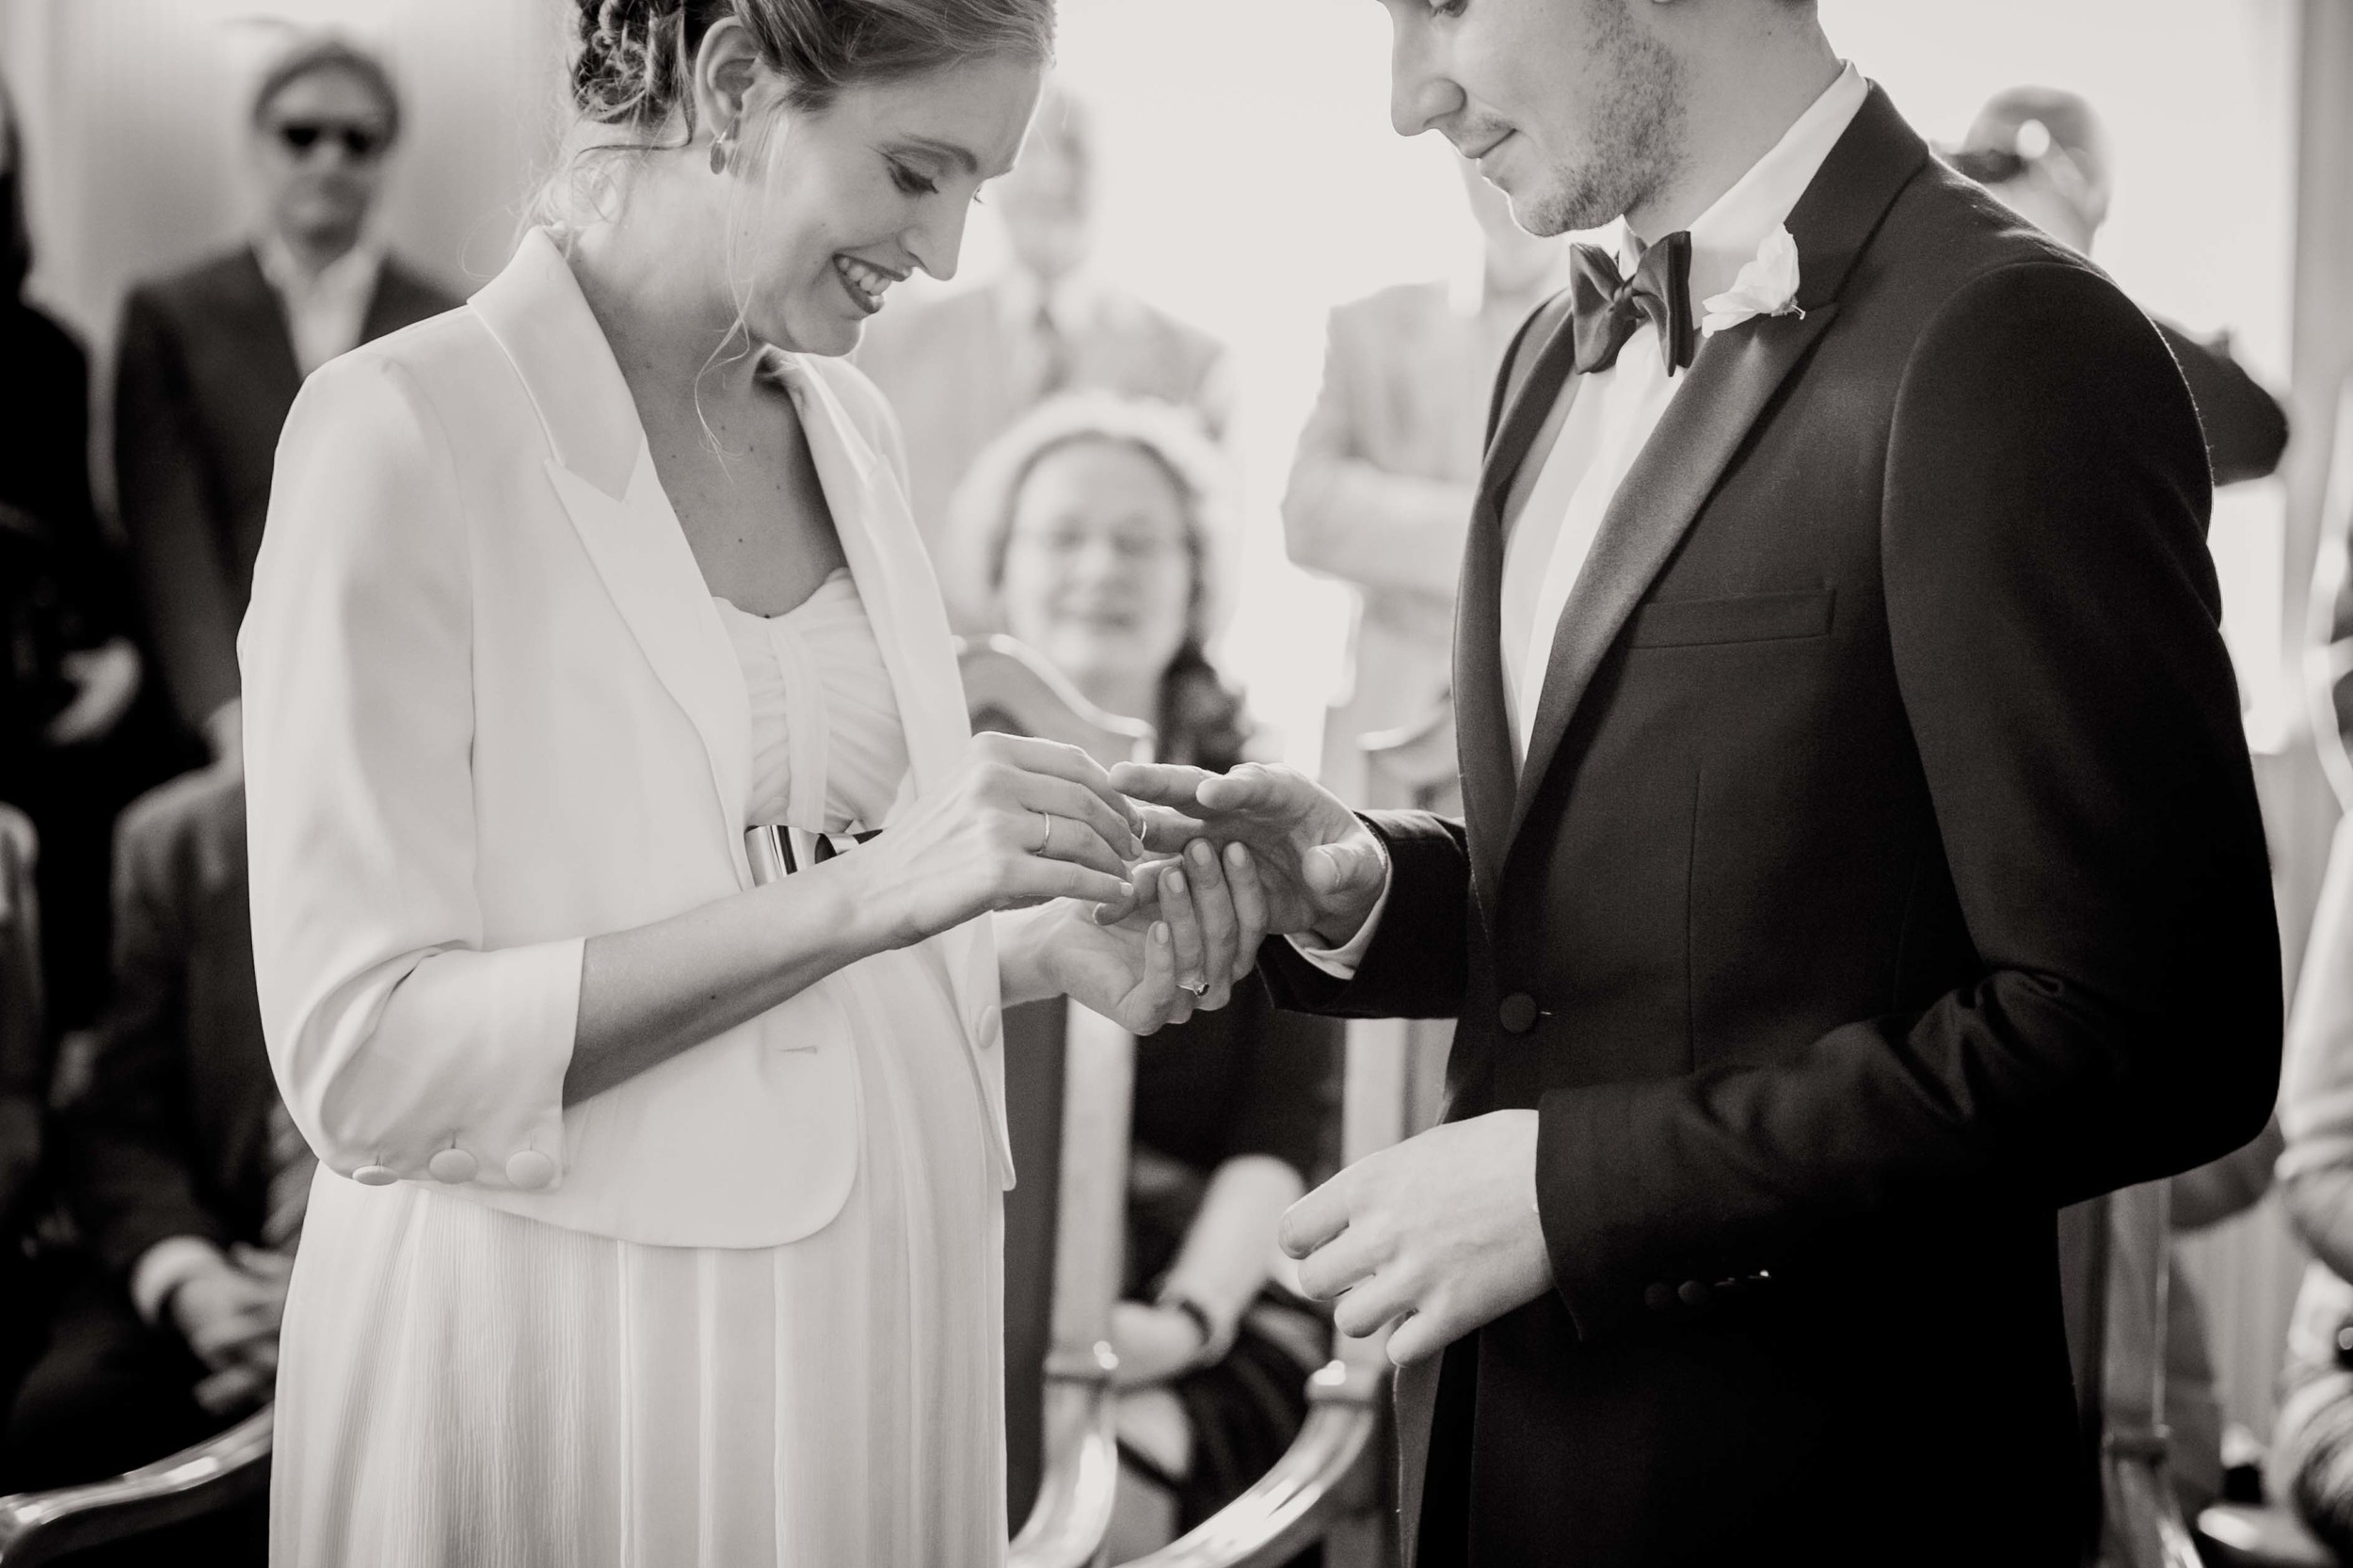 Berlin Hochzeitsfotografie_Fran Burrows Fotografie-60.jpg